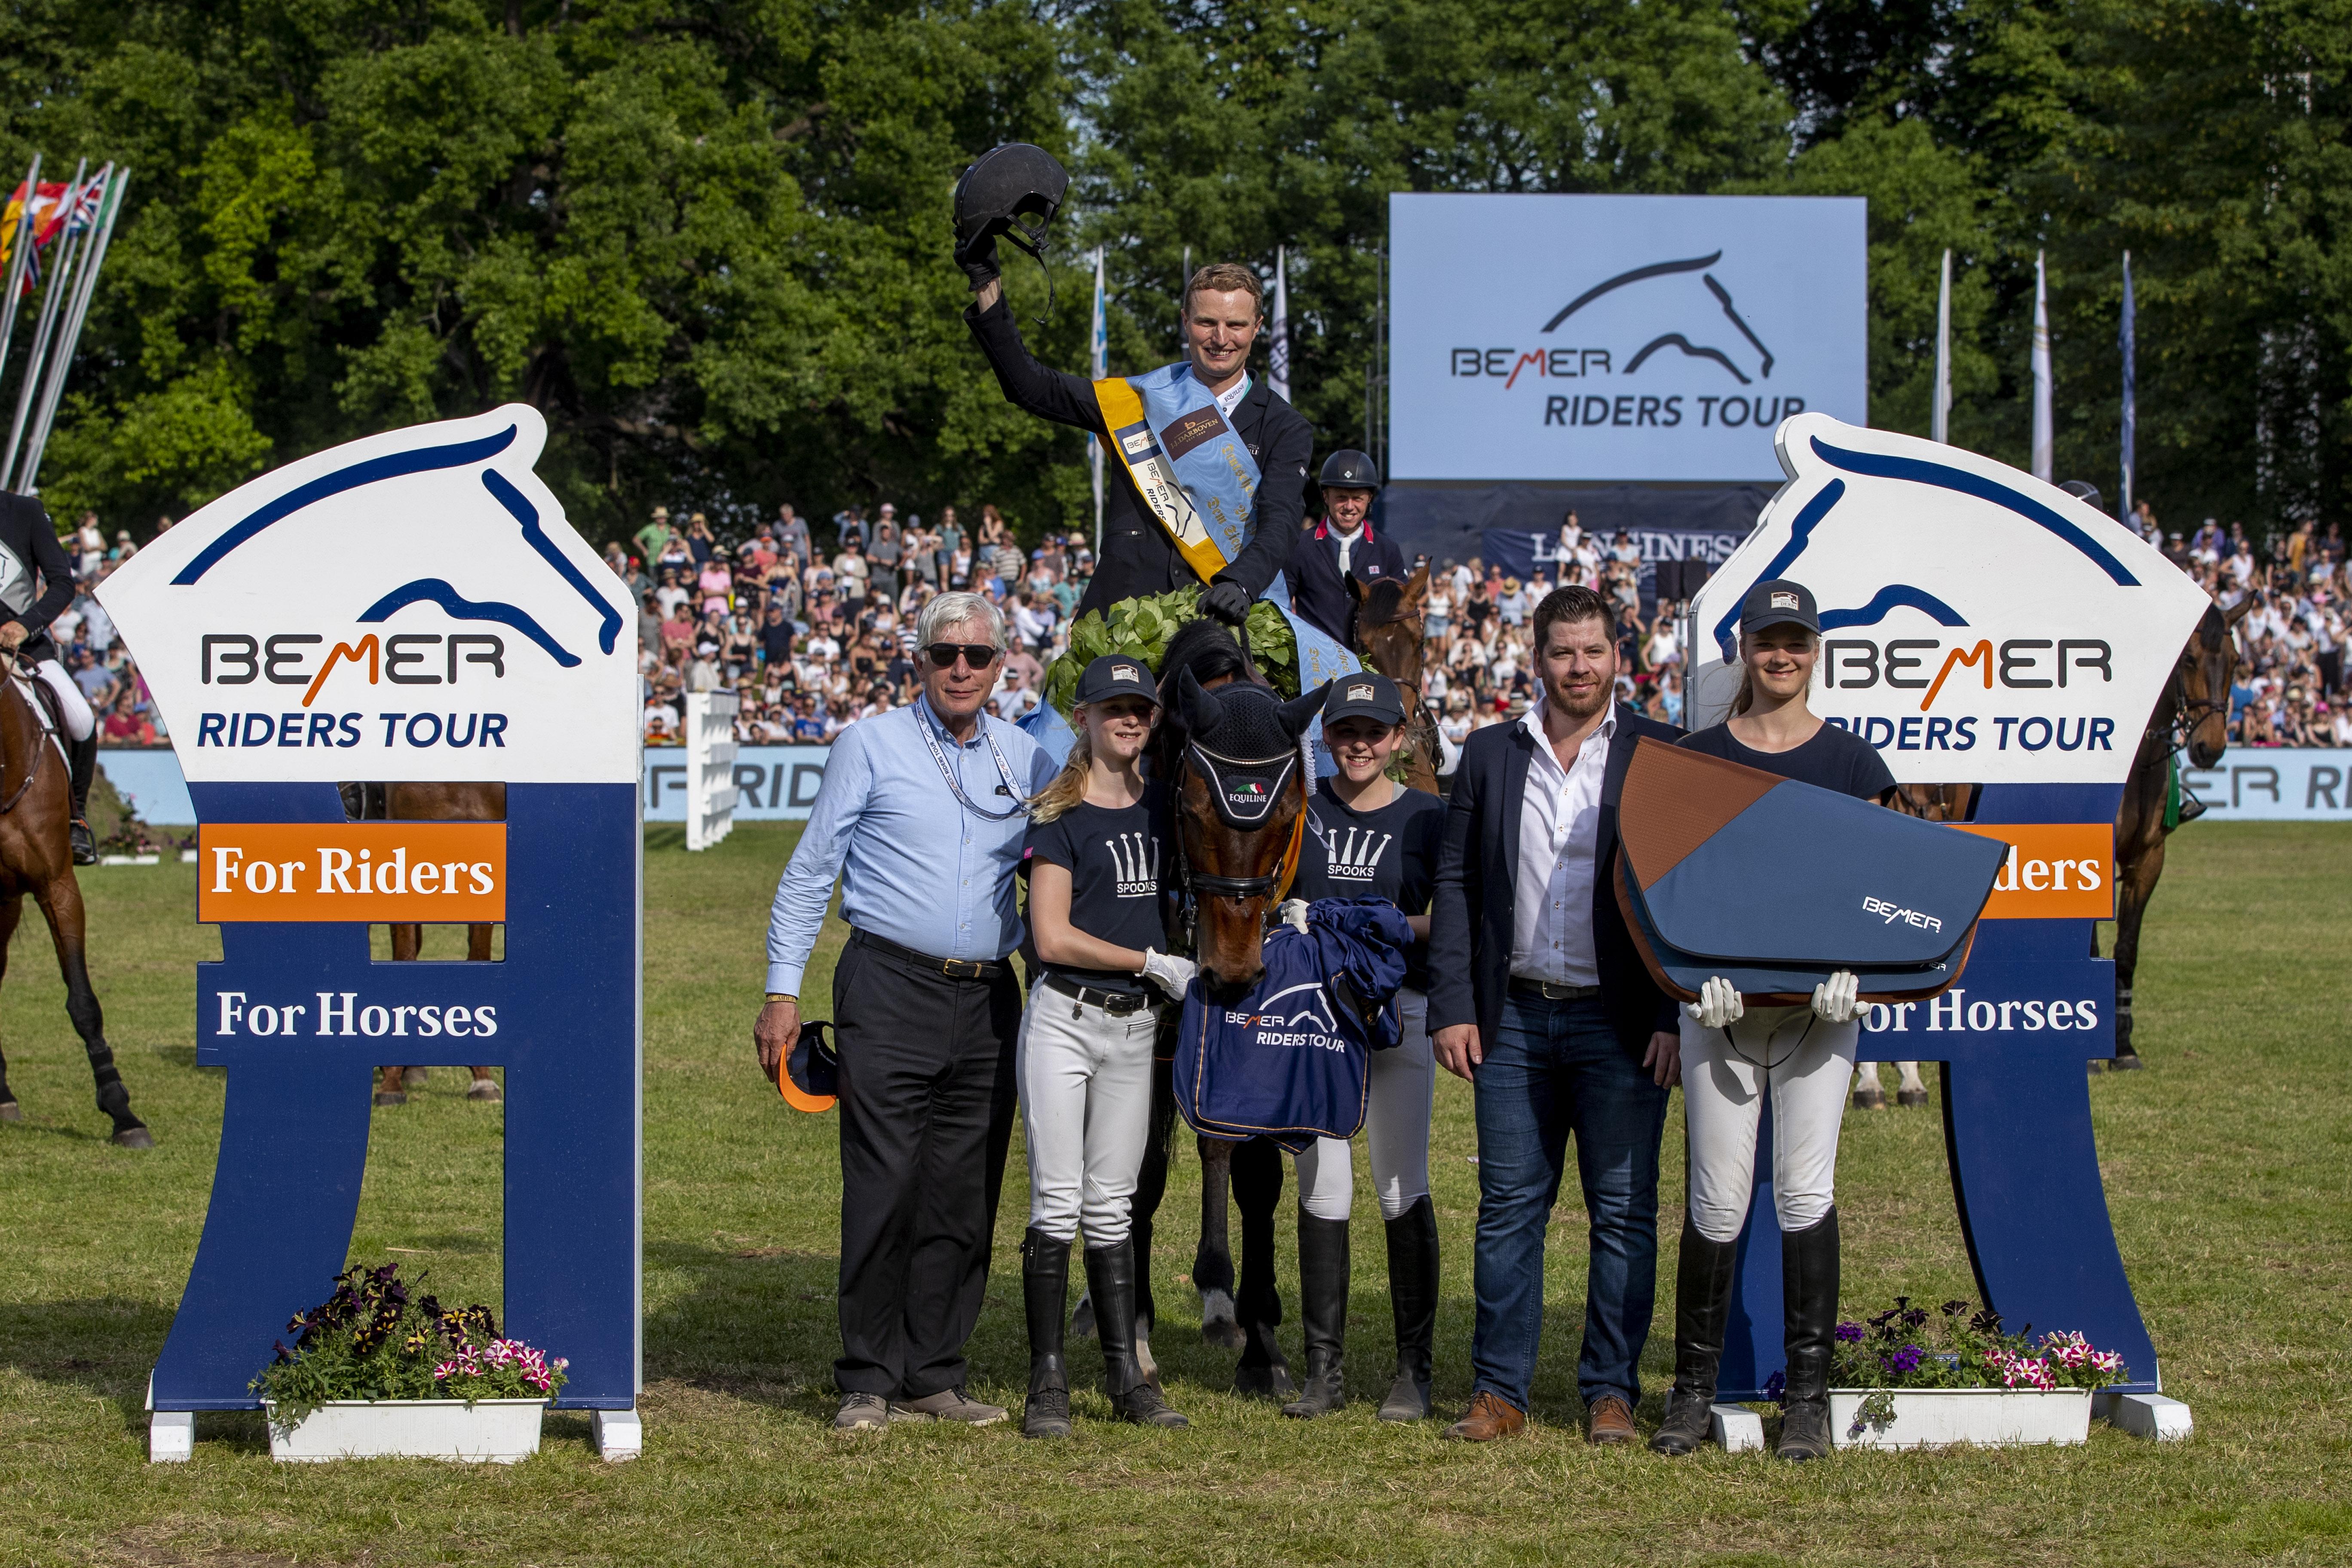 Lüneburg gewinnt spektakuläre Etappe der BEMER Riders Tour